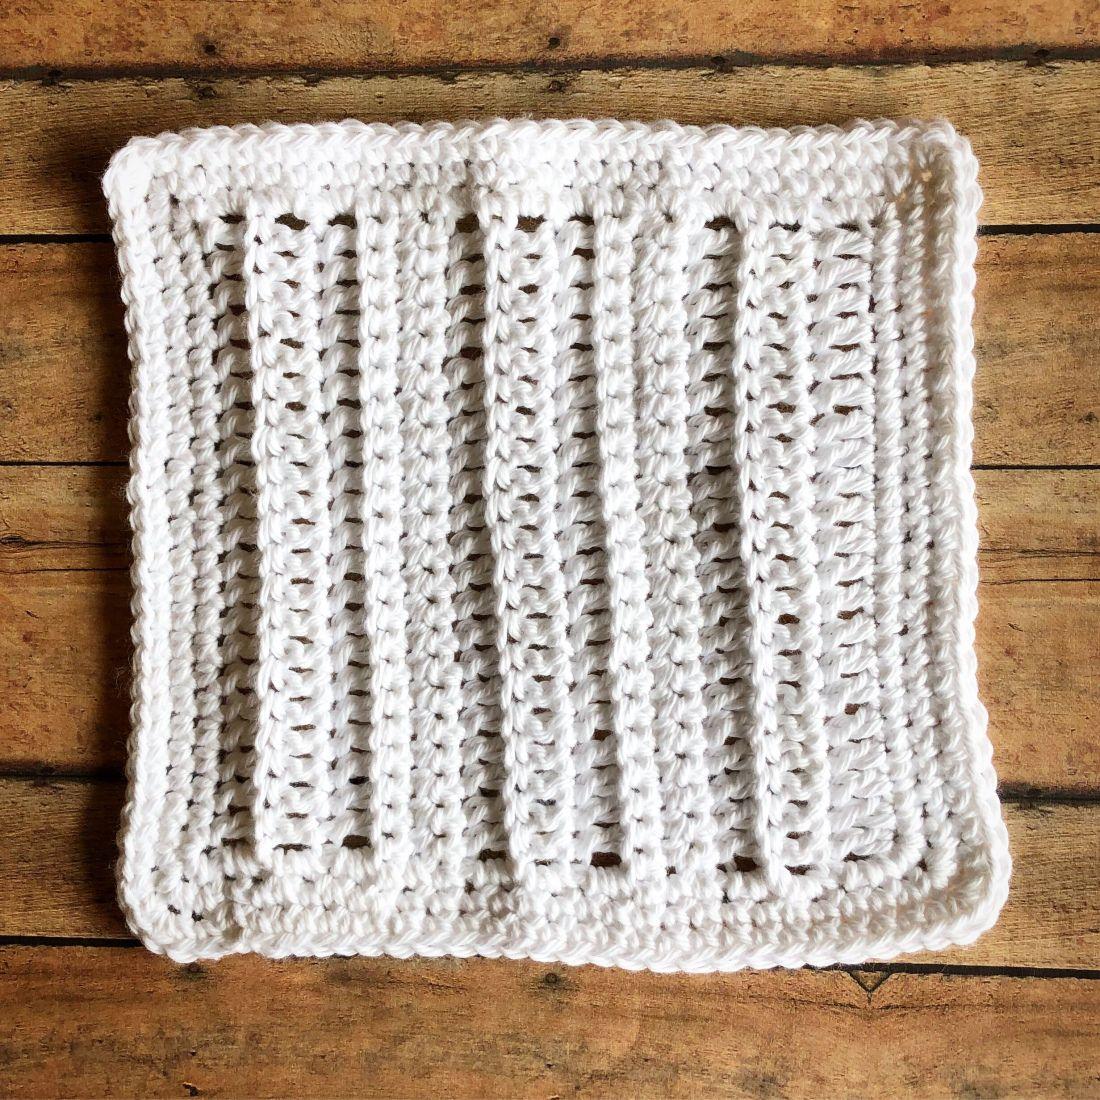 Crochet White Cotton Ribbed Dishcloth | Hookin\' Dishcloths. | Pinterest